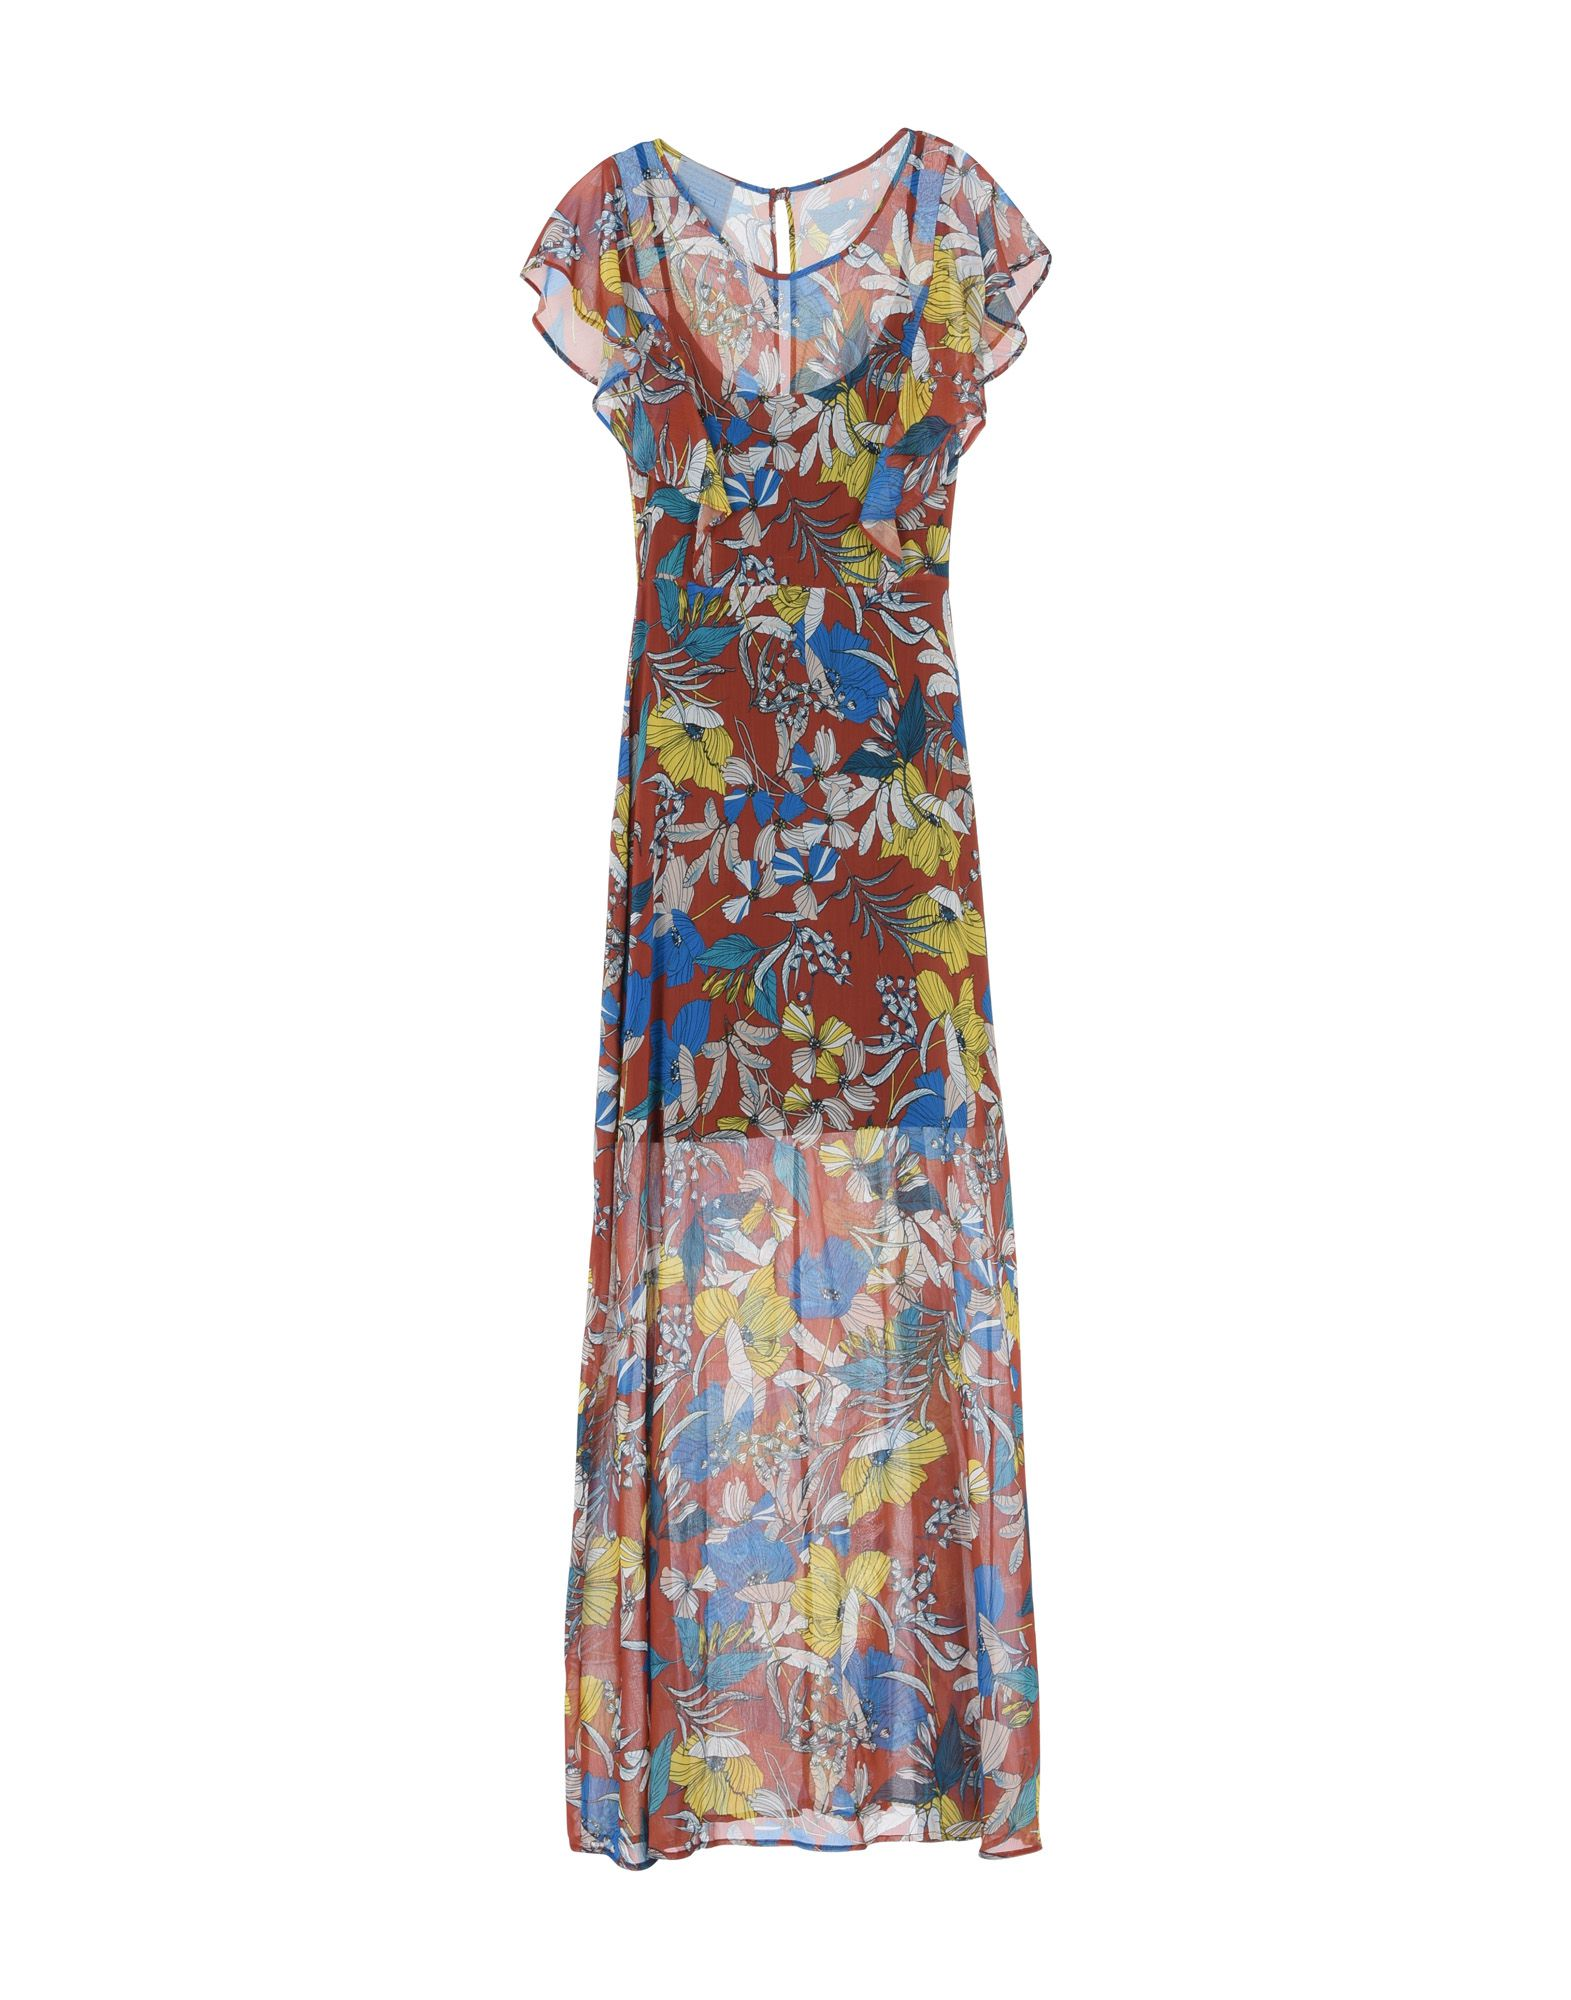 MIA SULIMAN Длинное платье